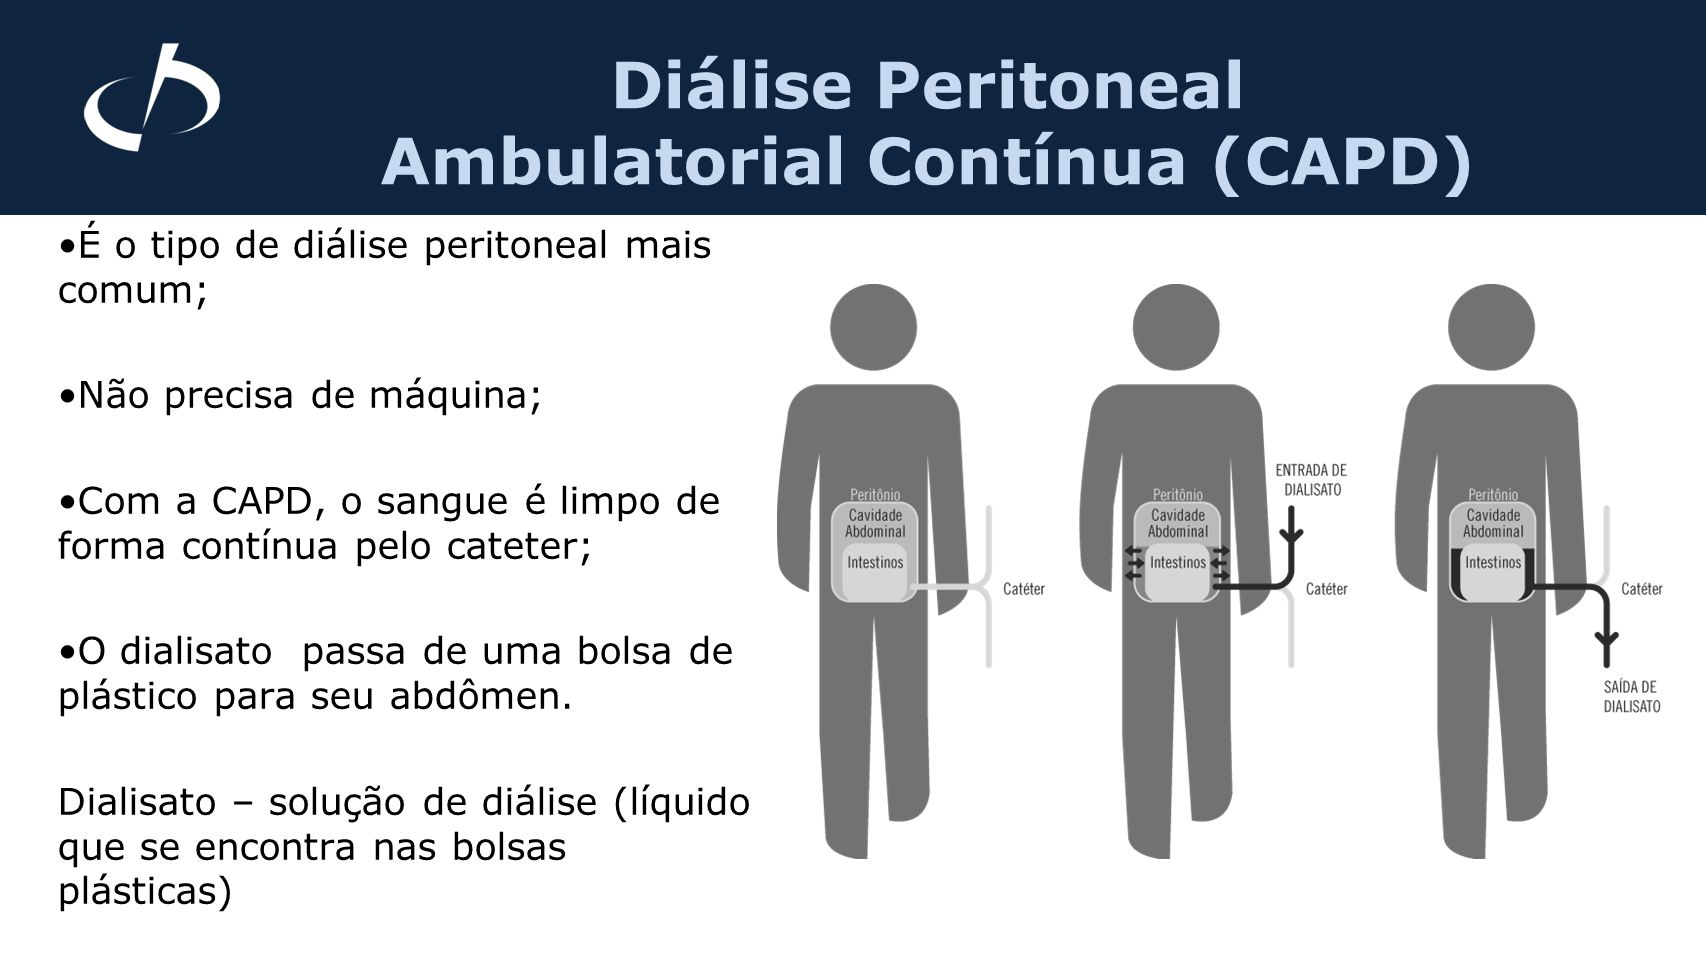 Diálise Peritoneal Ambulatorial Contínua (CAPD)